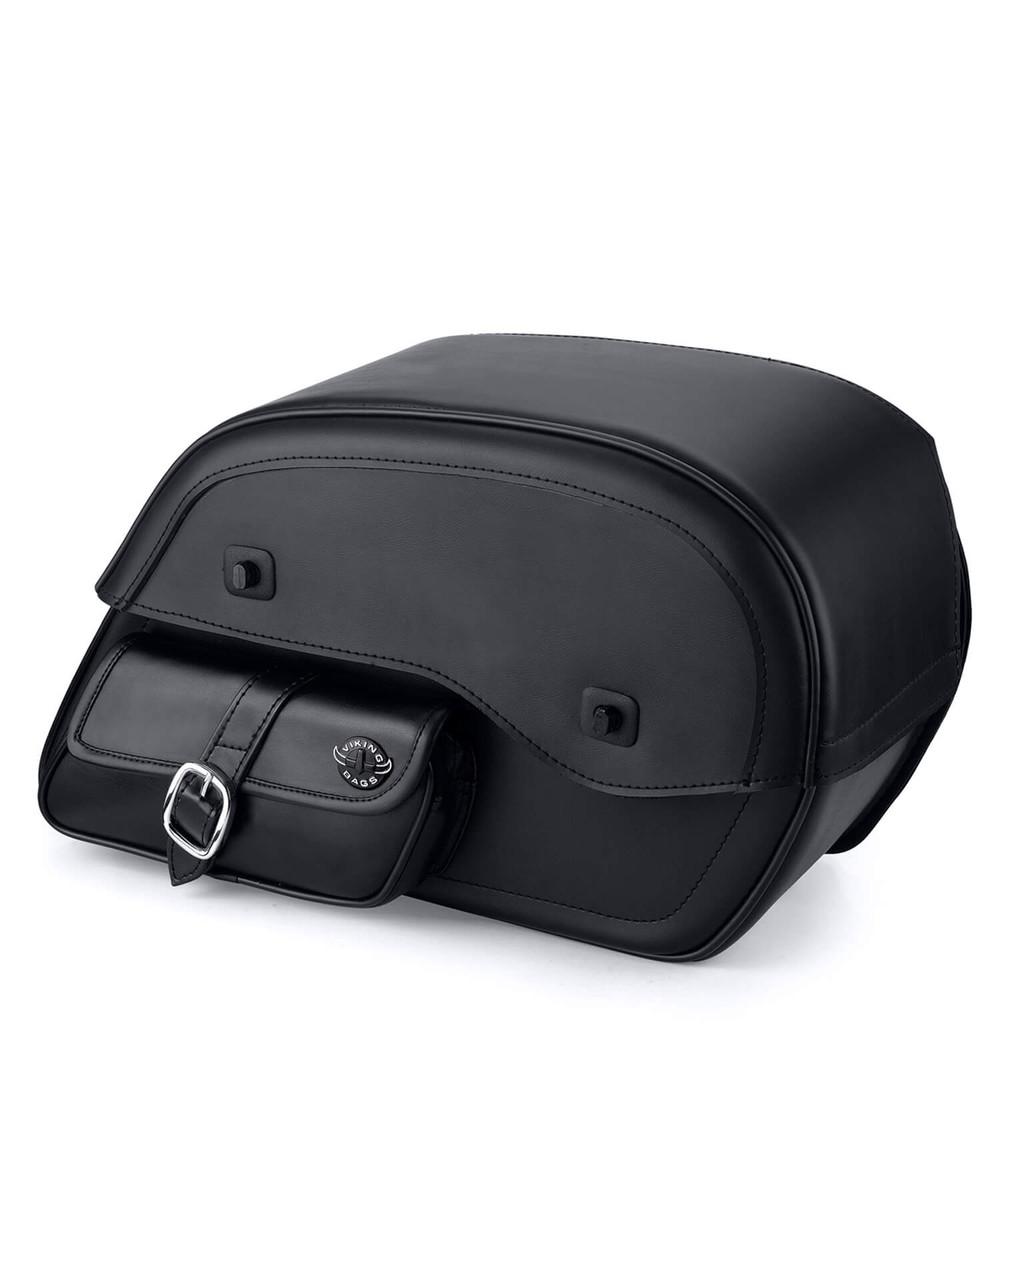 Victory High Ball SS Side Pocket Motorcycle Saddlebags Main Bag View